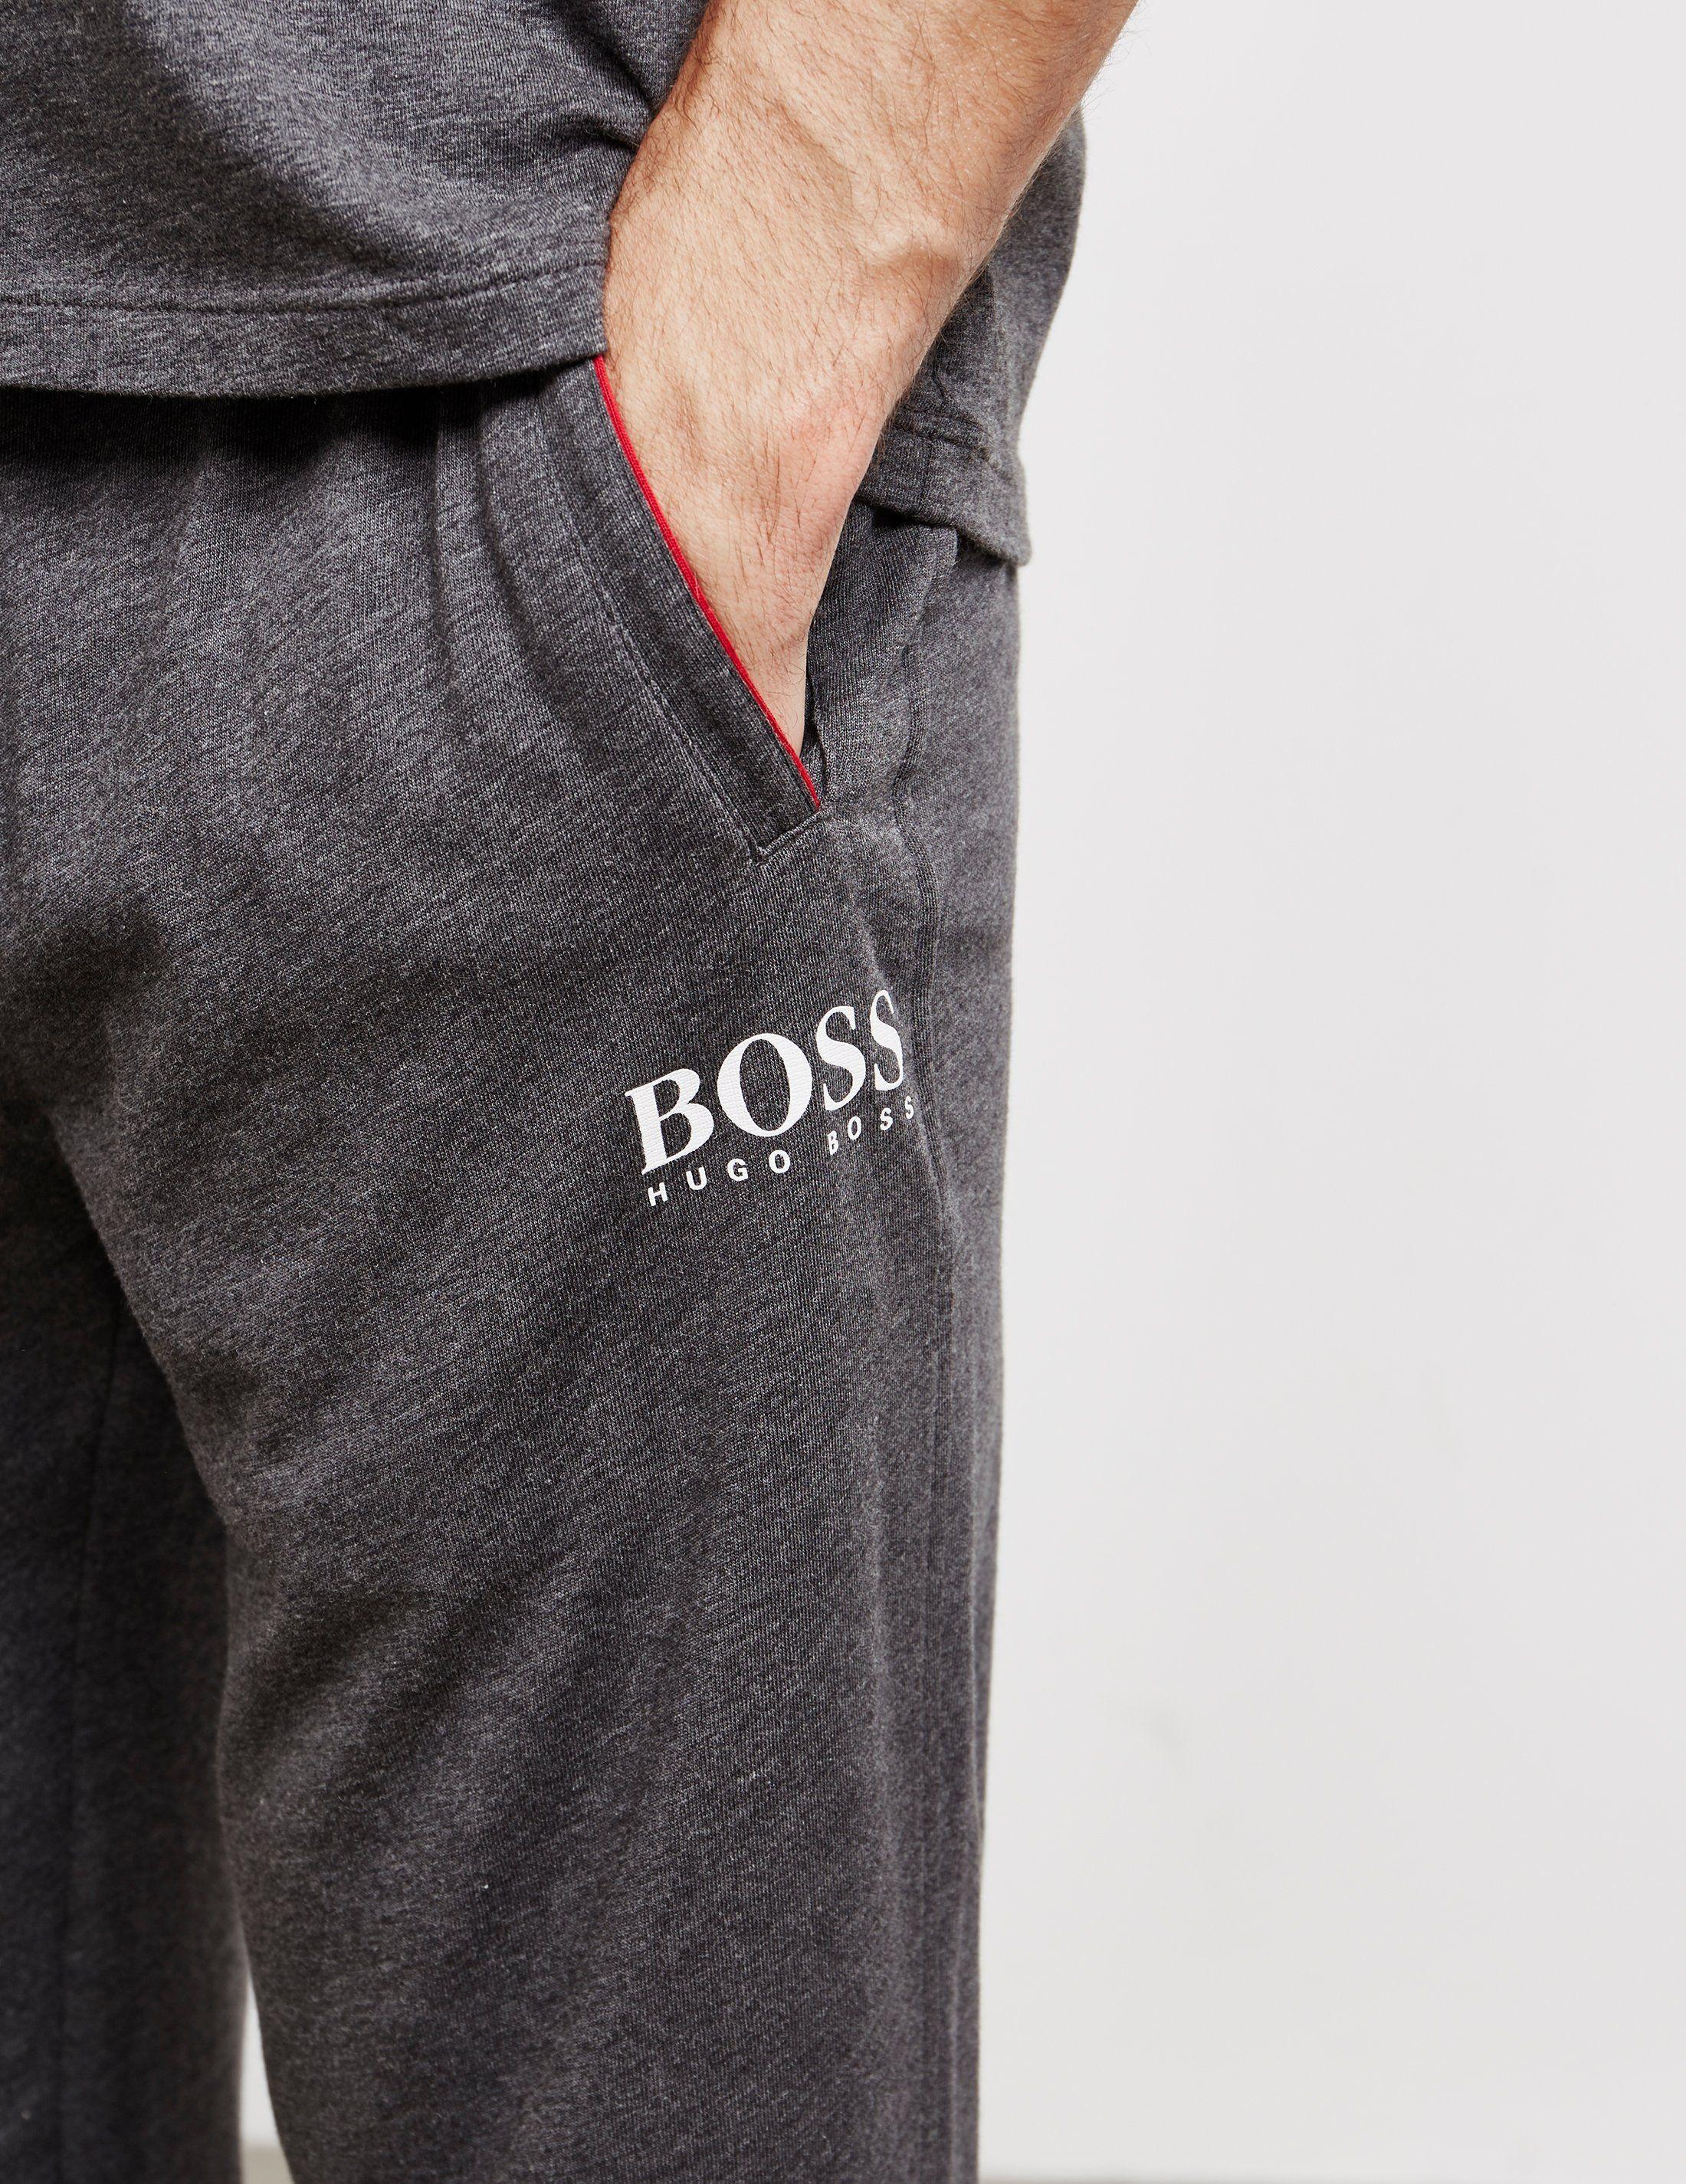 BOSS Small Logo Joggers